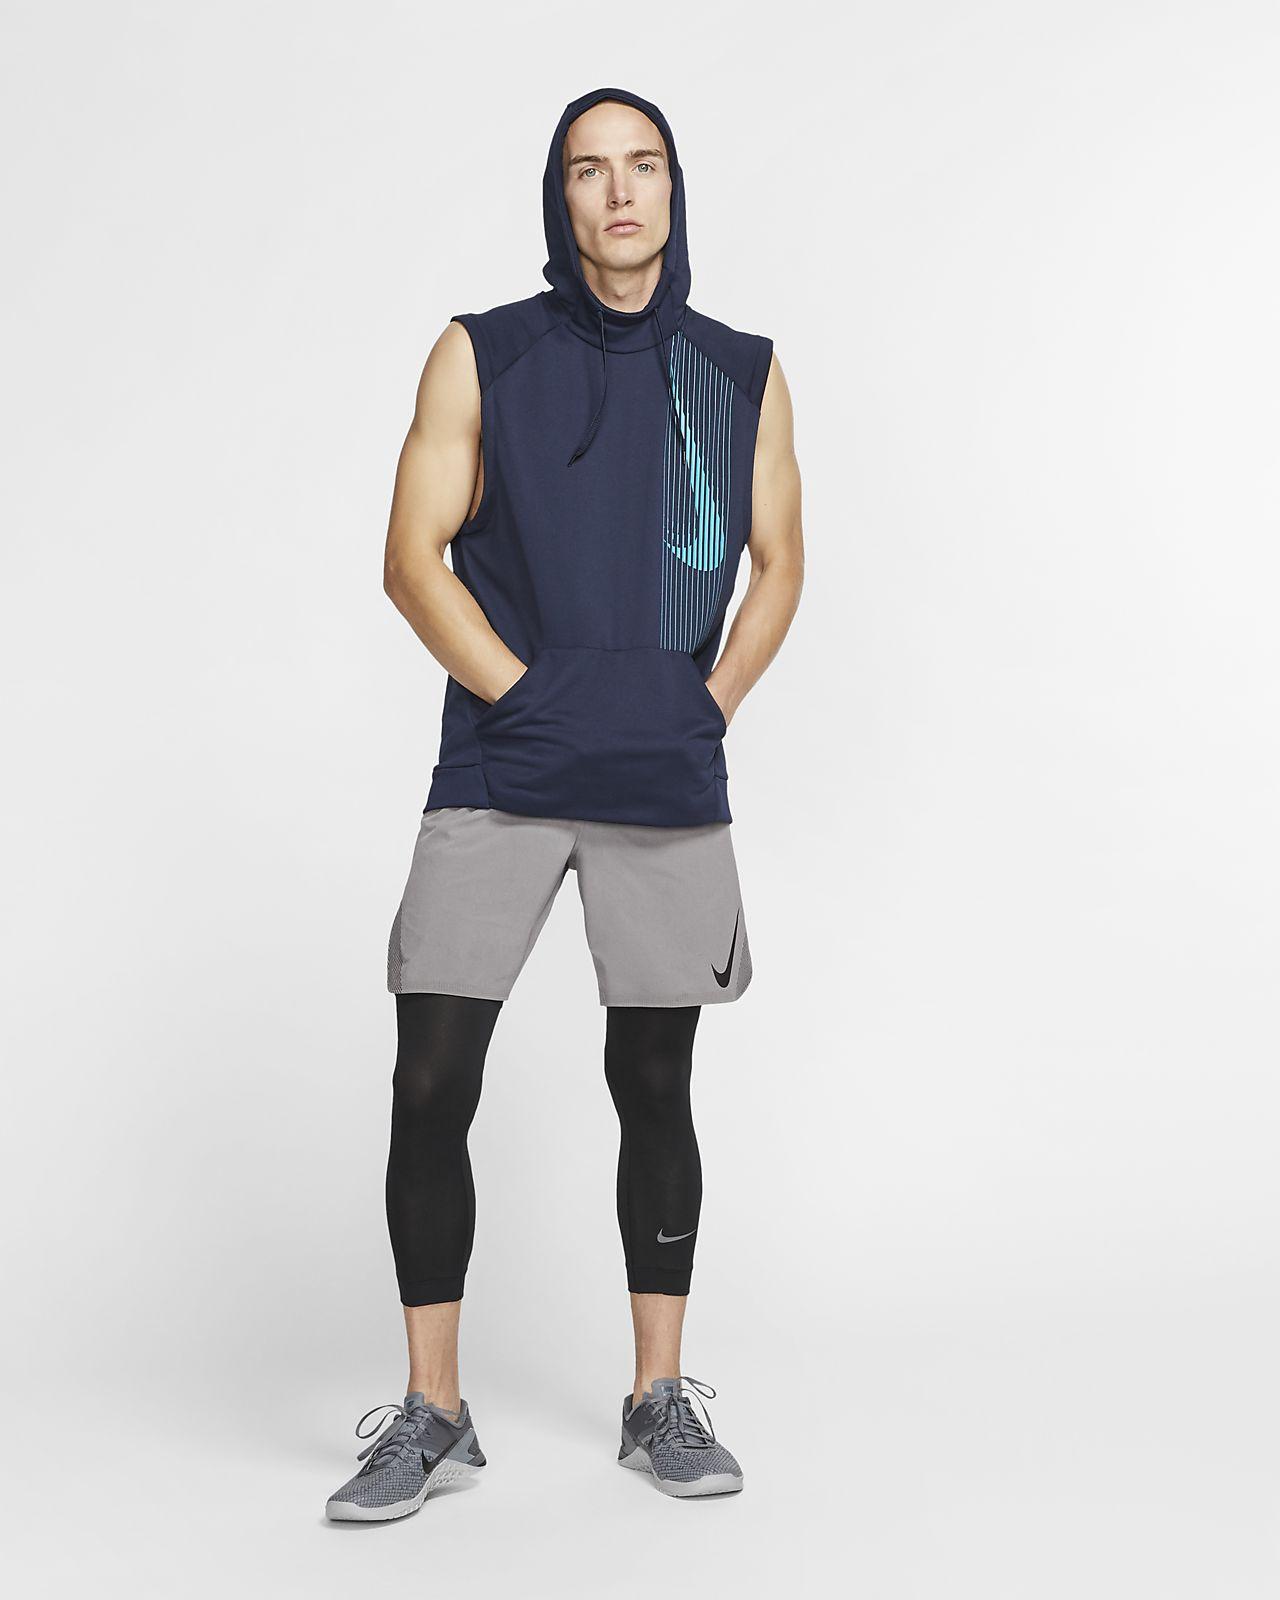 57ce7678 Nike Dri-FIT Men's Sleeveless Training Hoodie. Nike.com CA